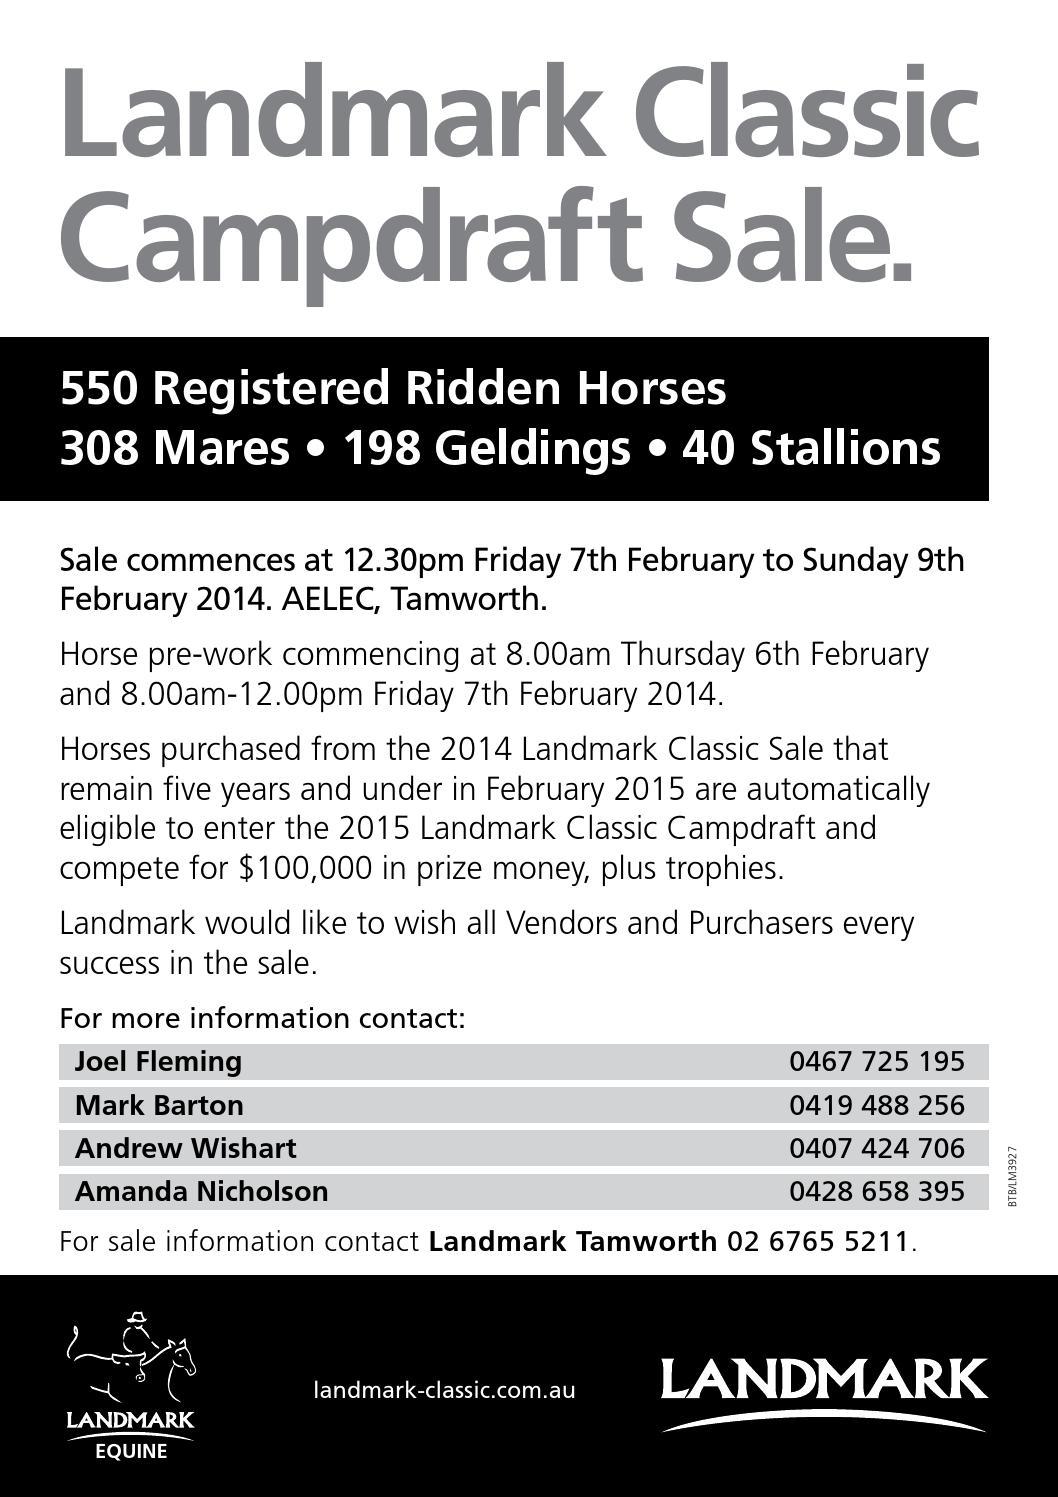 2014 Landmark Classic Campdraft Sale Catalogue By Teresa Herbert Issuu Delta Kite Diagram Hq Maestro Ii Hawk